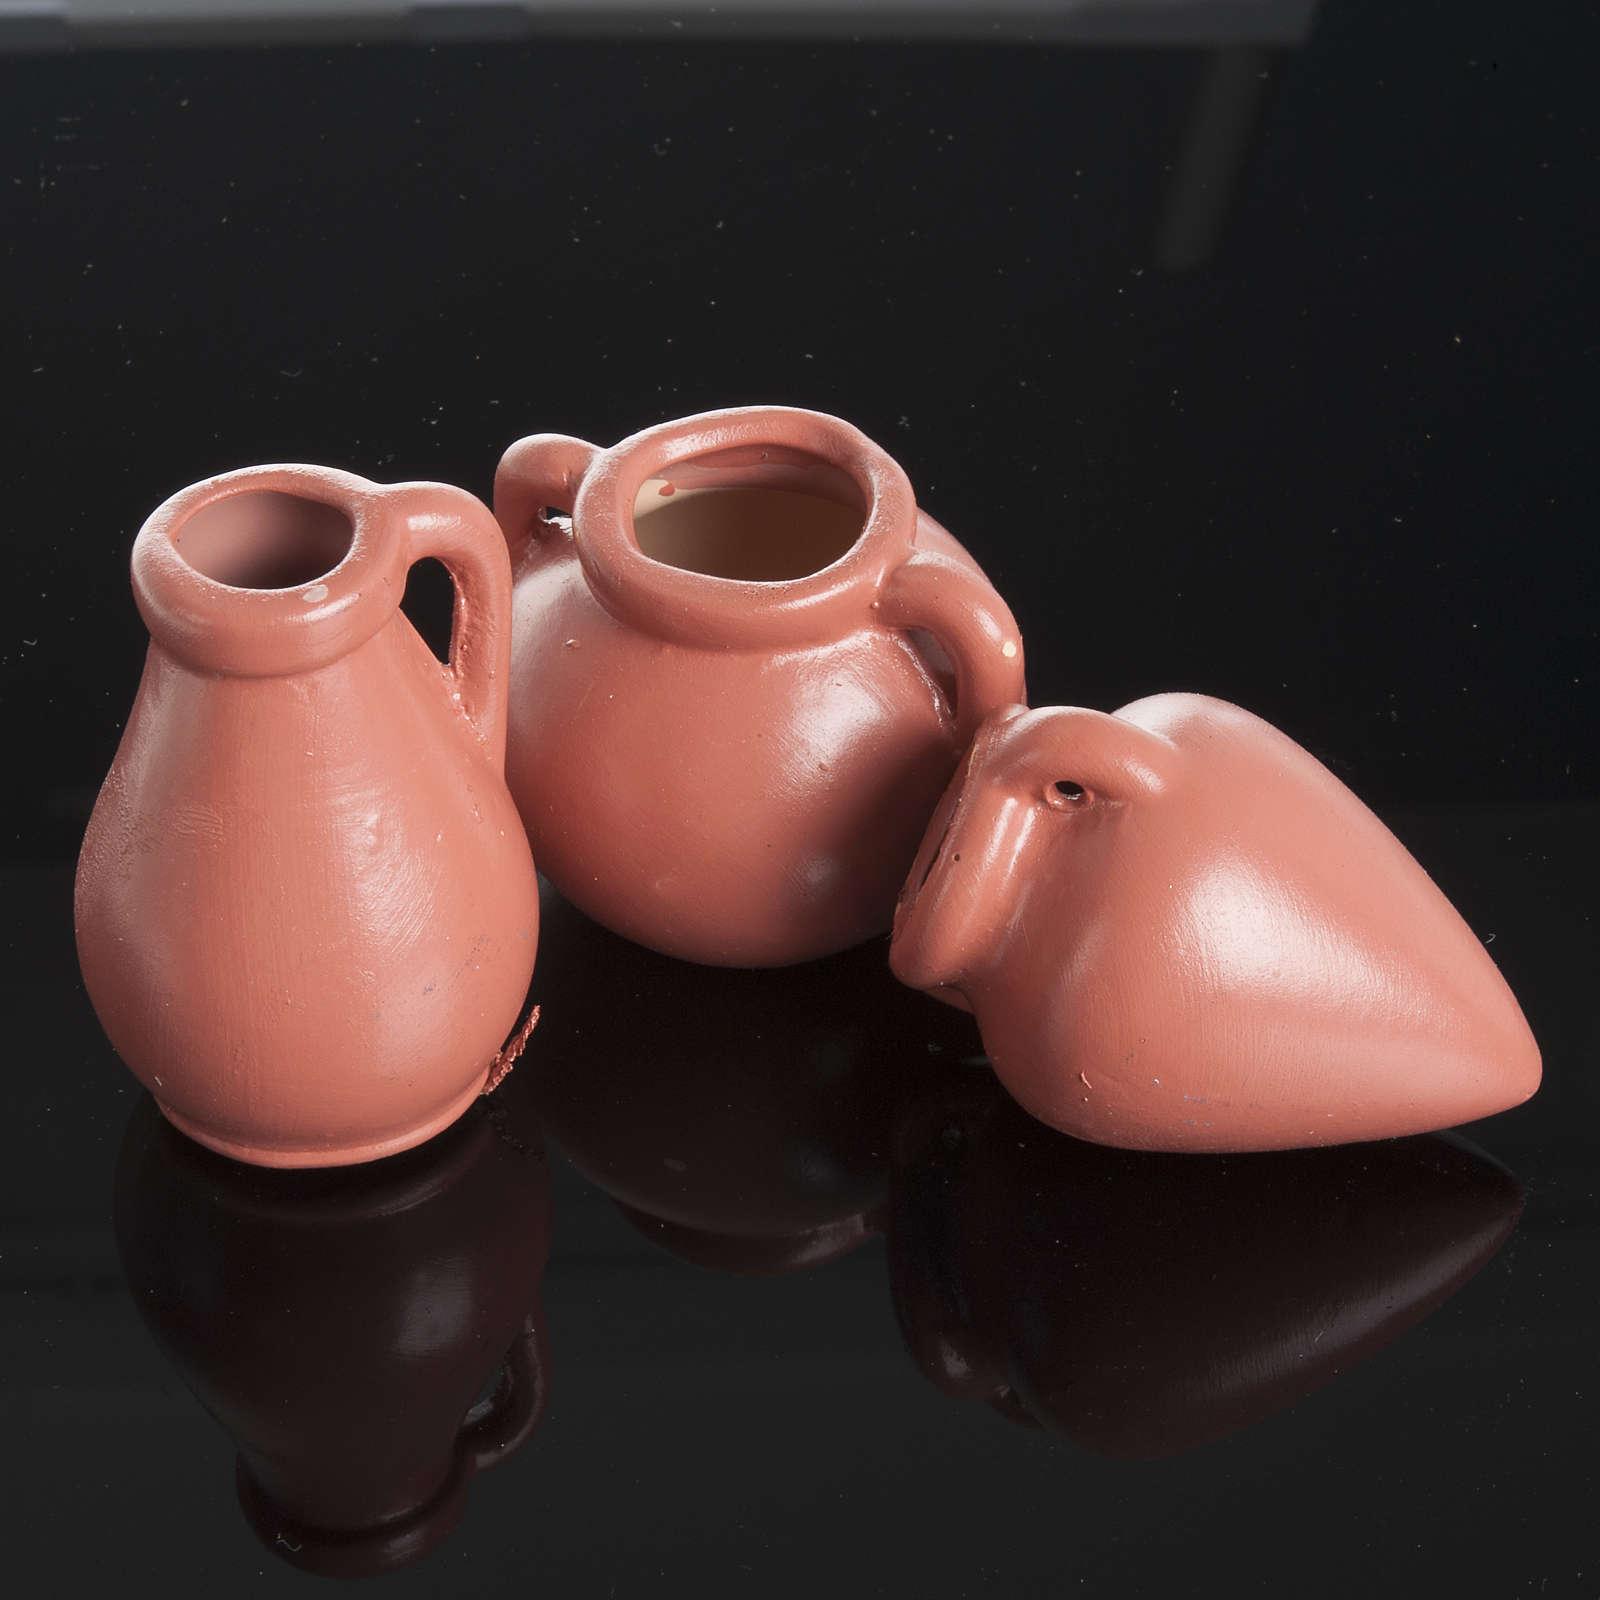 Nativity accessory, resin amphorae, set of 3pieces 4